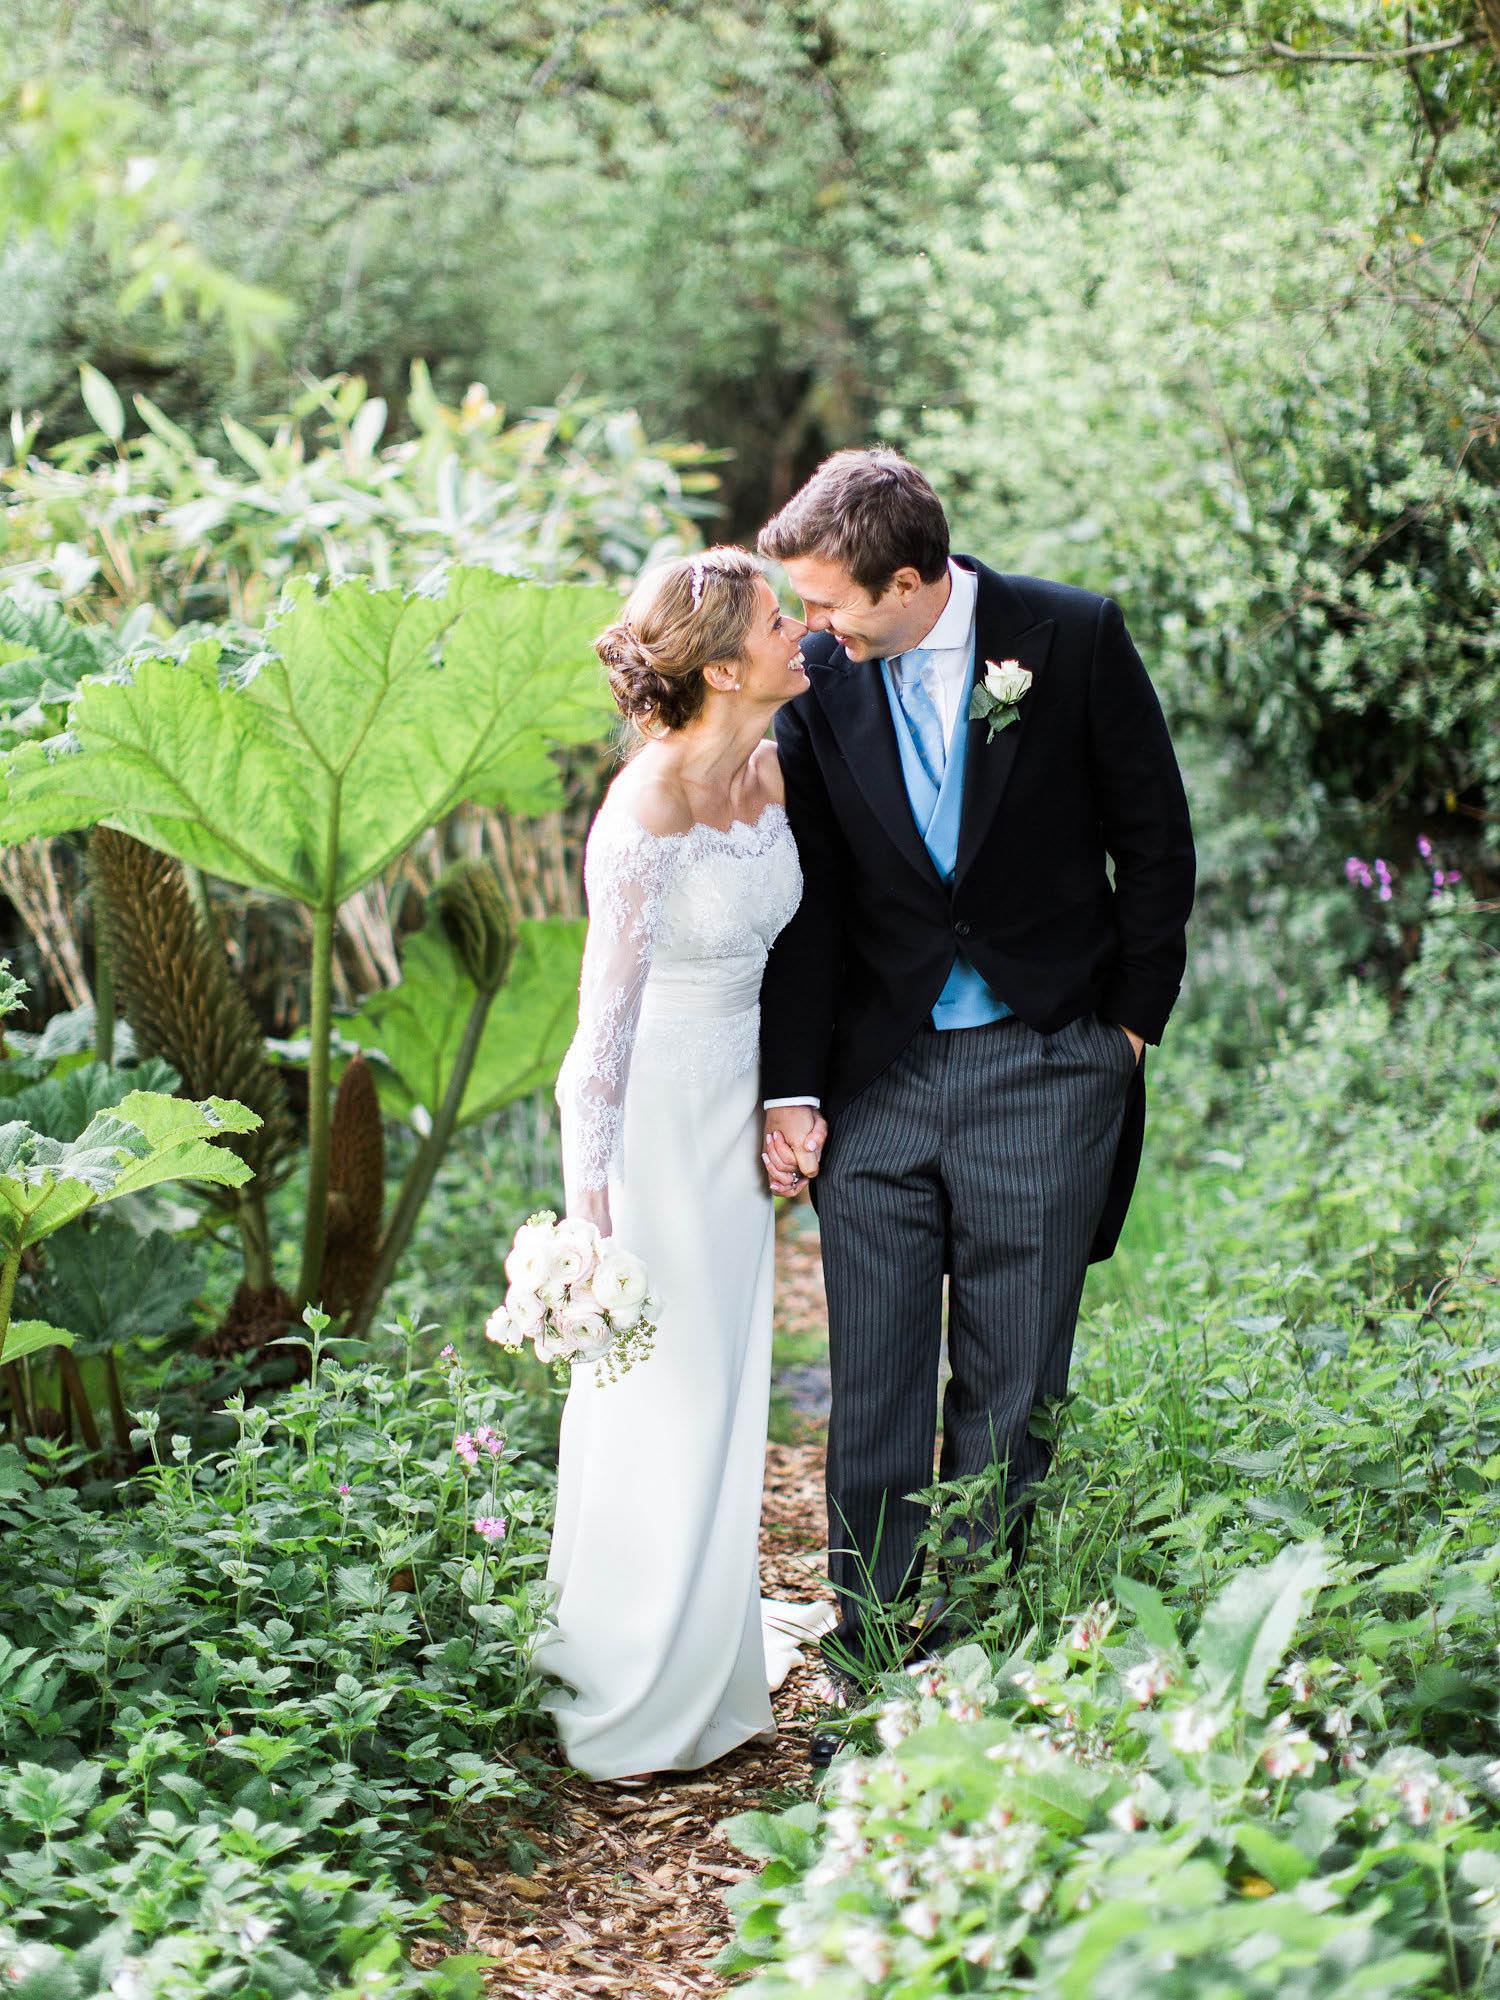 Amy O'Boyle Photography- Destination & UK Fine Art Film Wedding Photographer- English Countryside Wedding-16.jpg